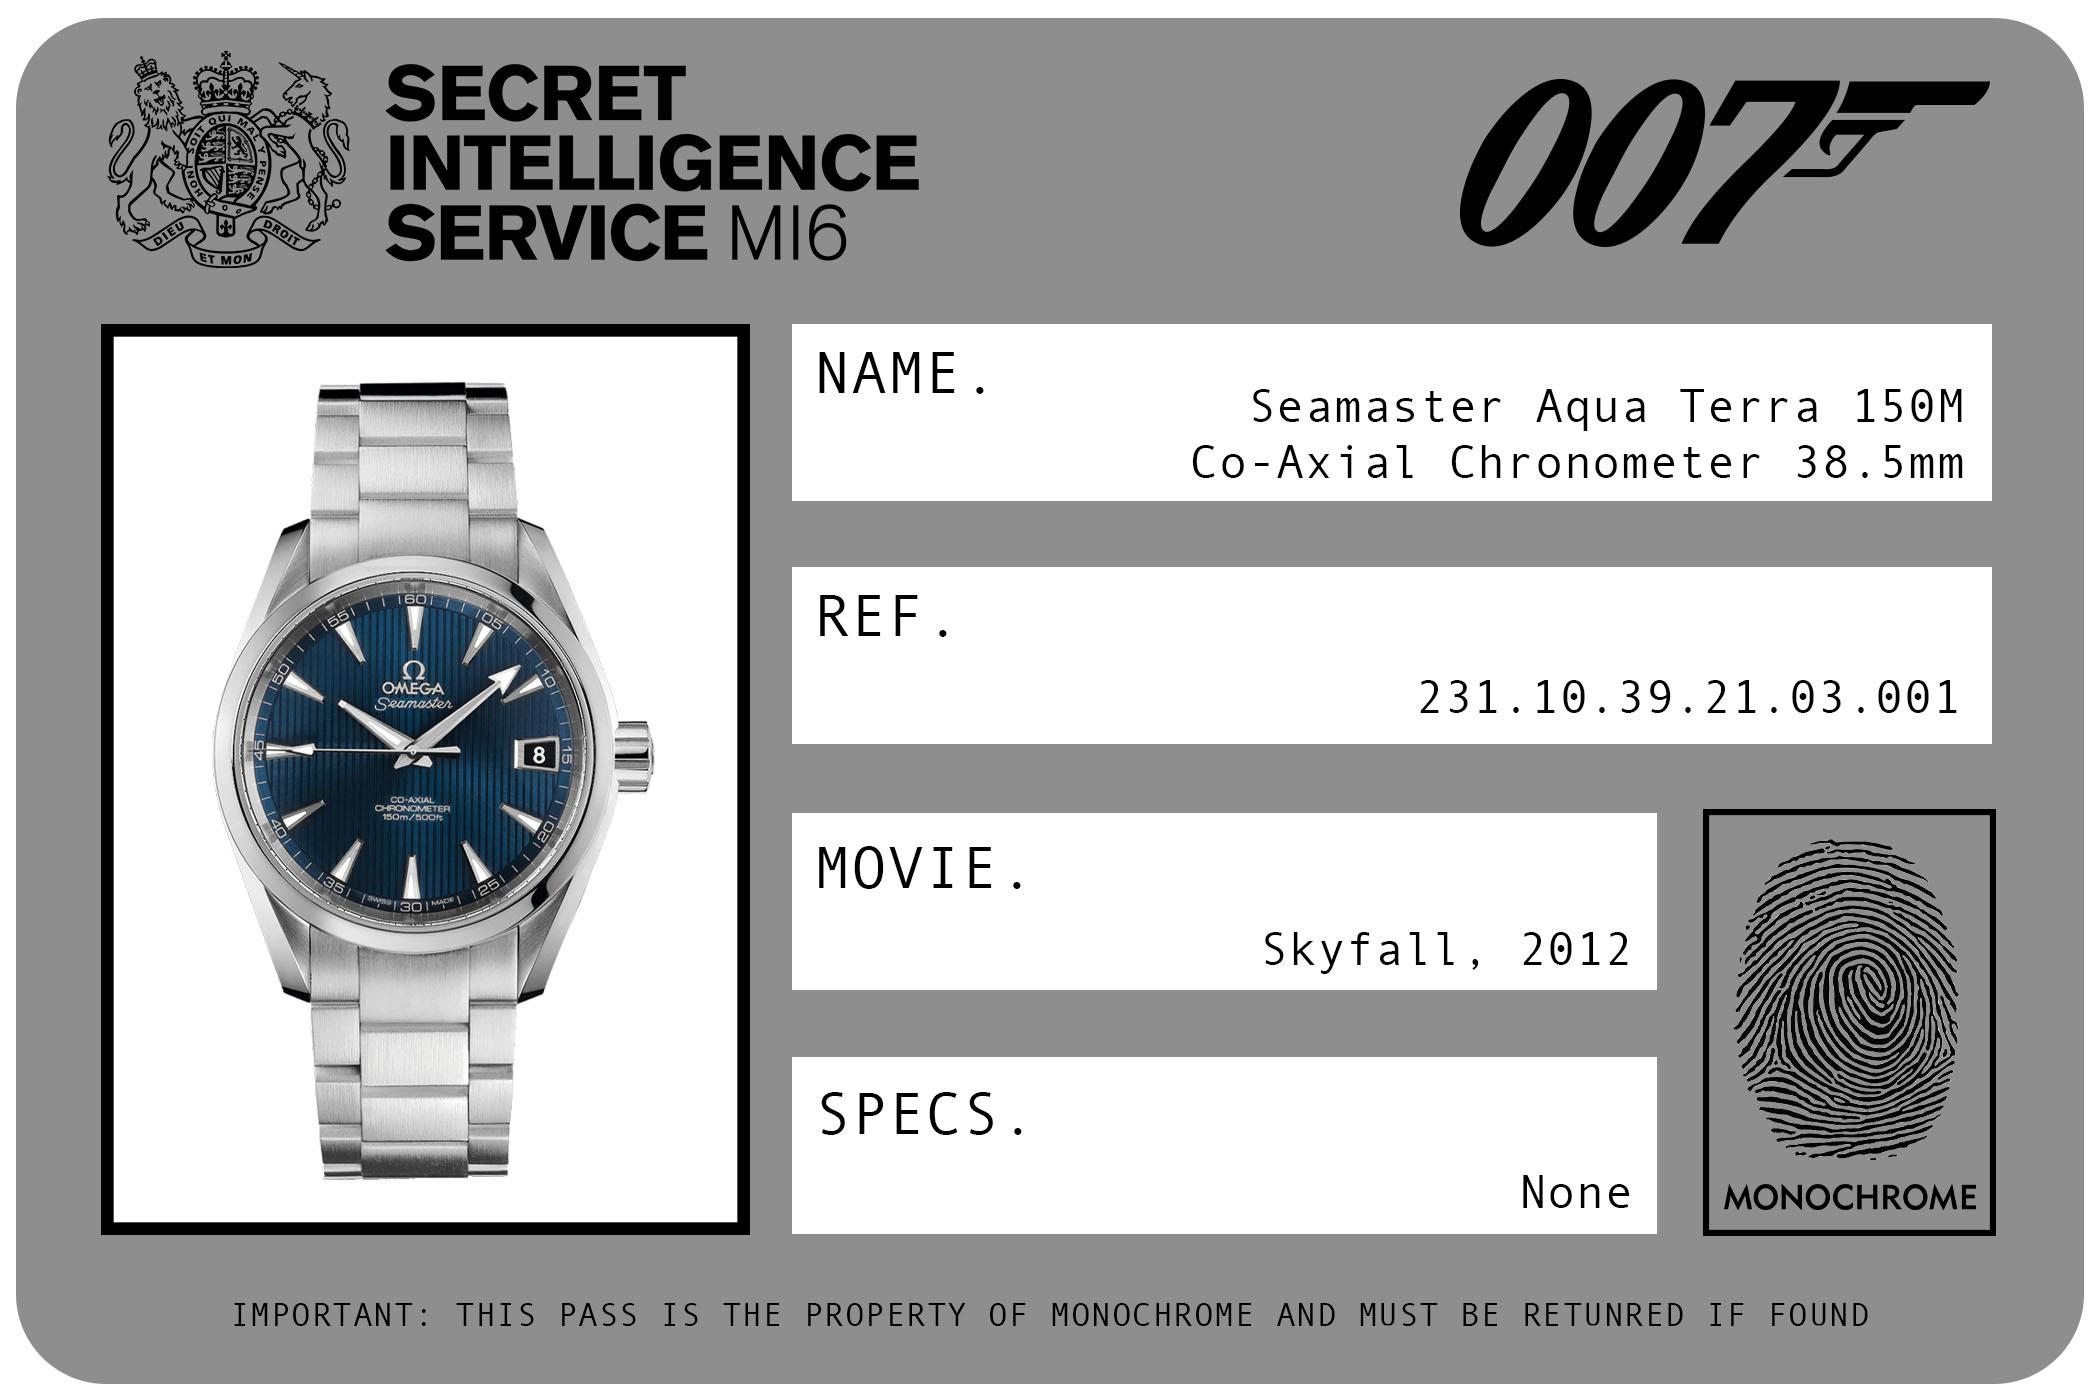 2012 - Omega Seamaster Aqua Terra 150M Co-Axial Chronometer 38.5mm 231.10.39.21.03.001 James Bond Skyfall ID Card